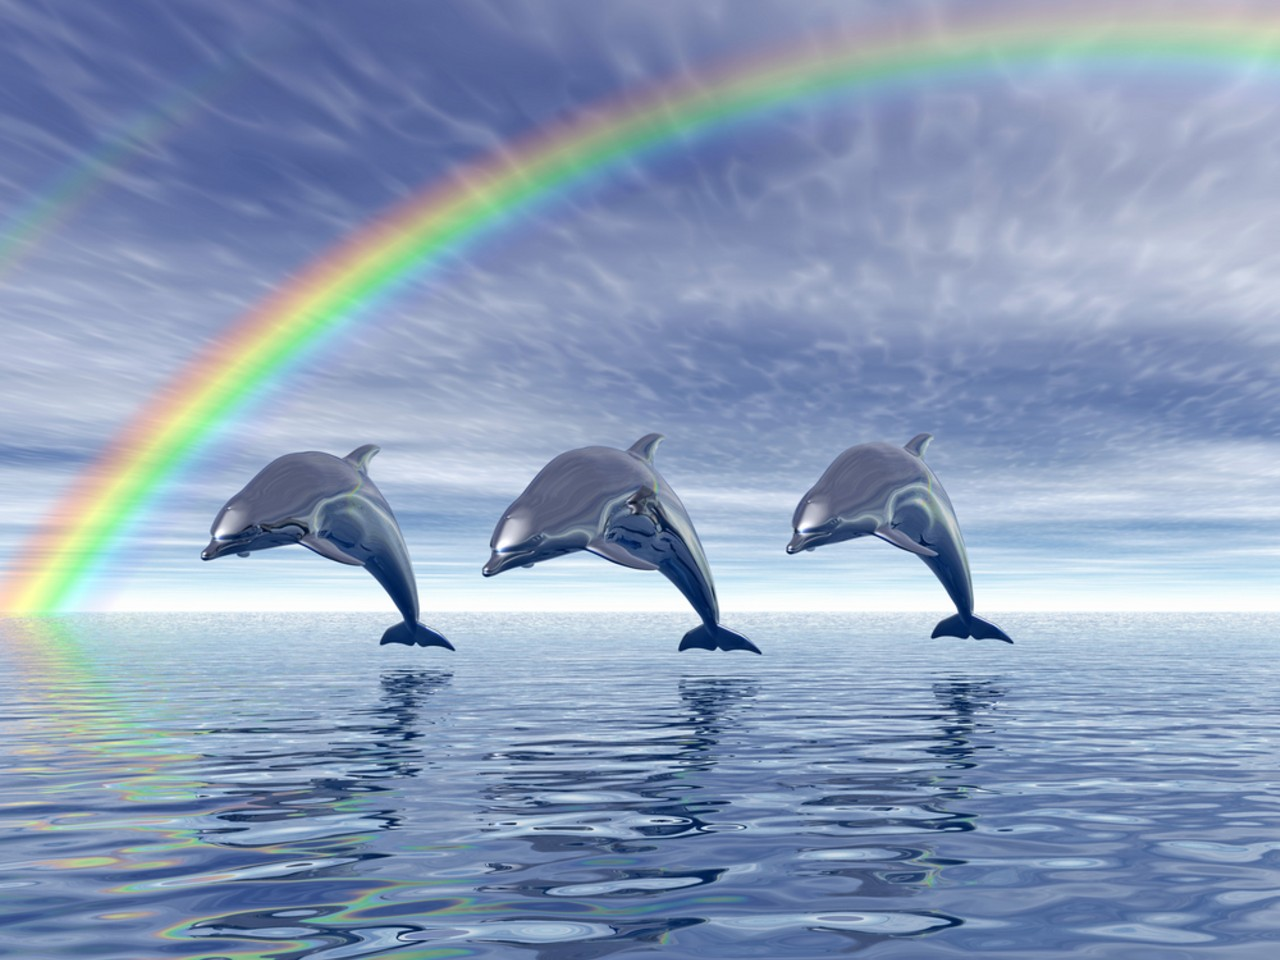 Dolphin Backgrounds download on the digitalimagemakerworldcom 1280x960